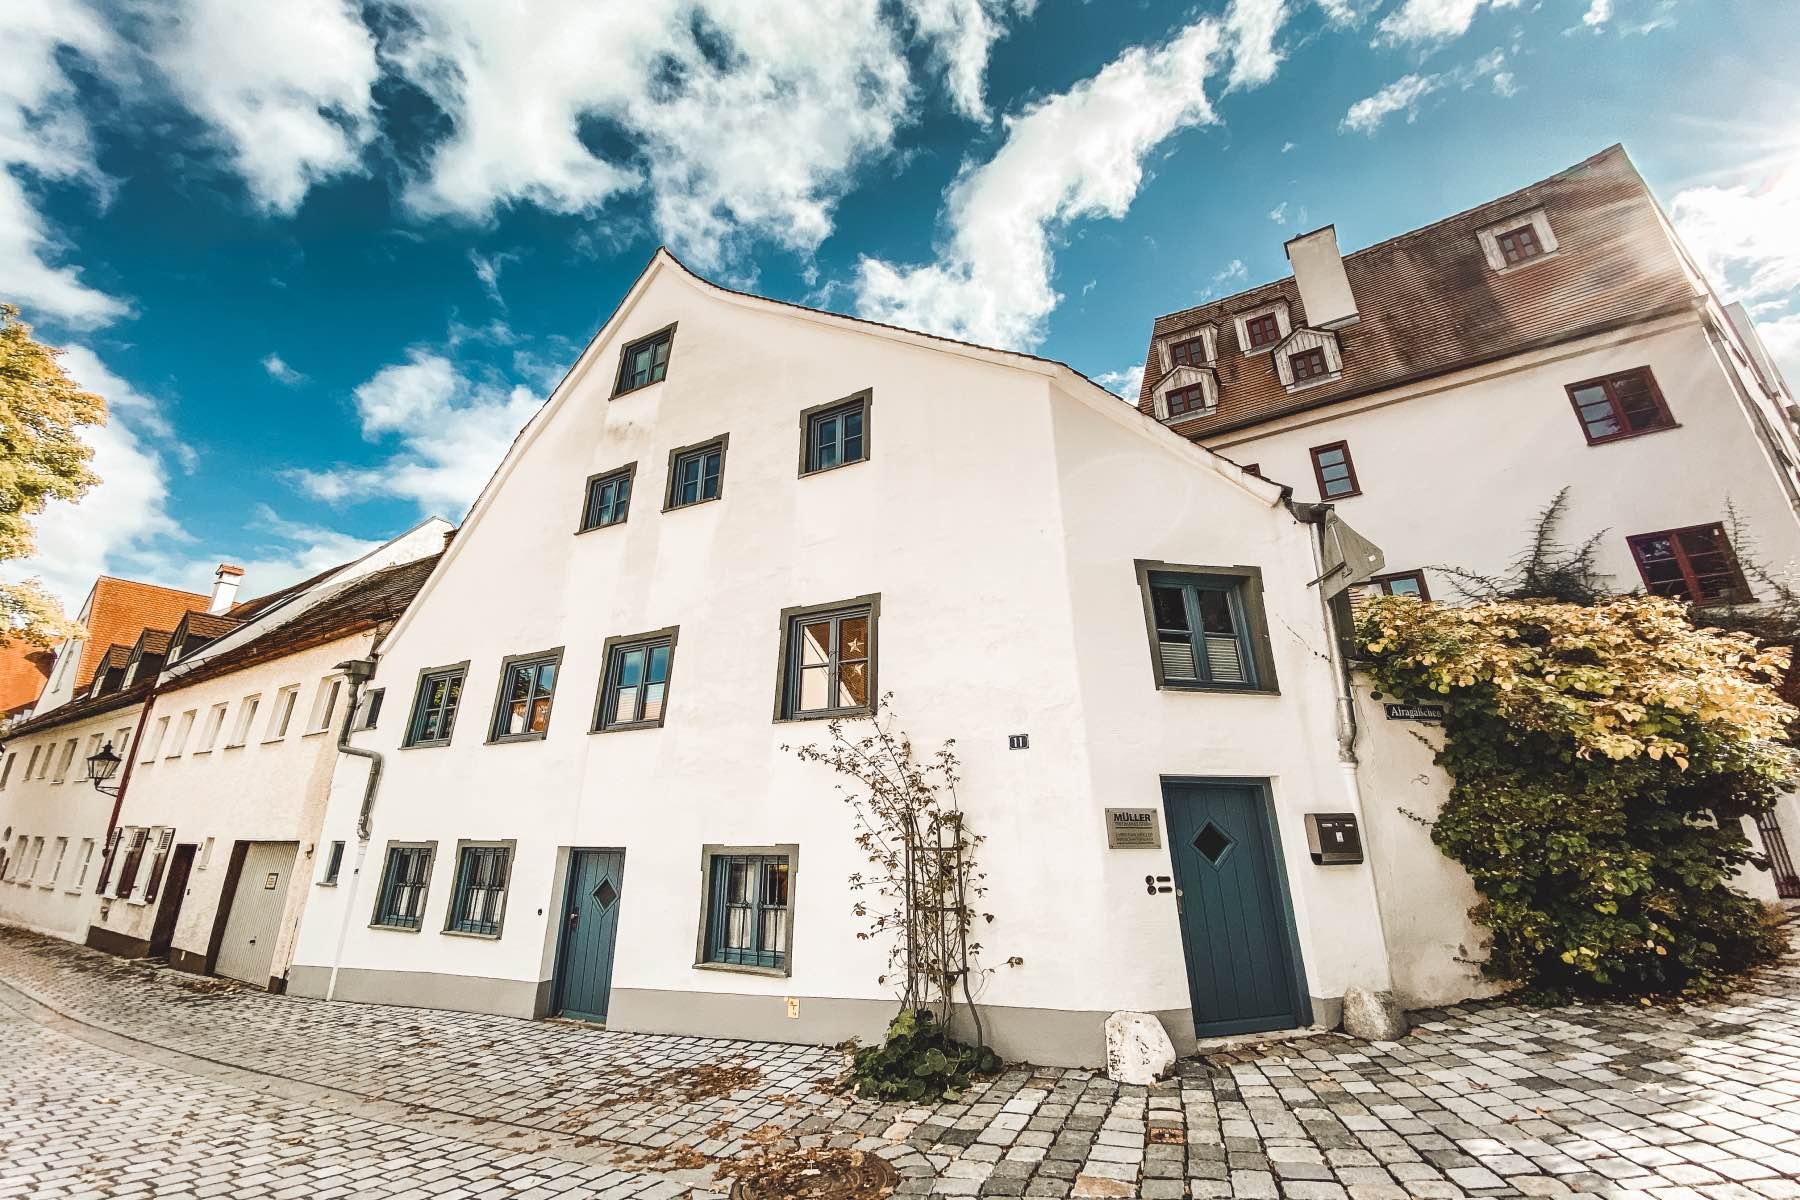 geheimtipp Augsburg Häuser